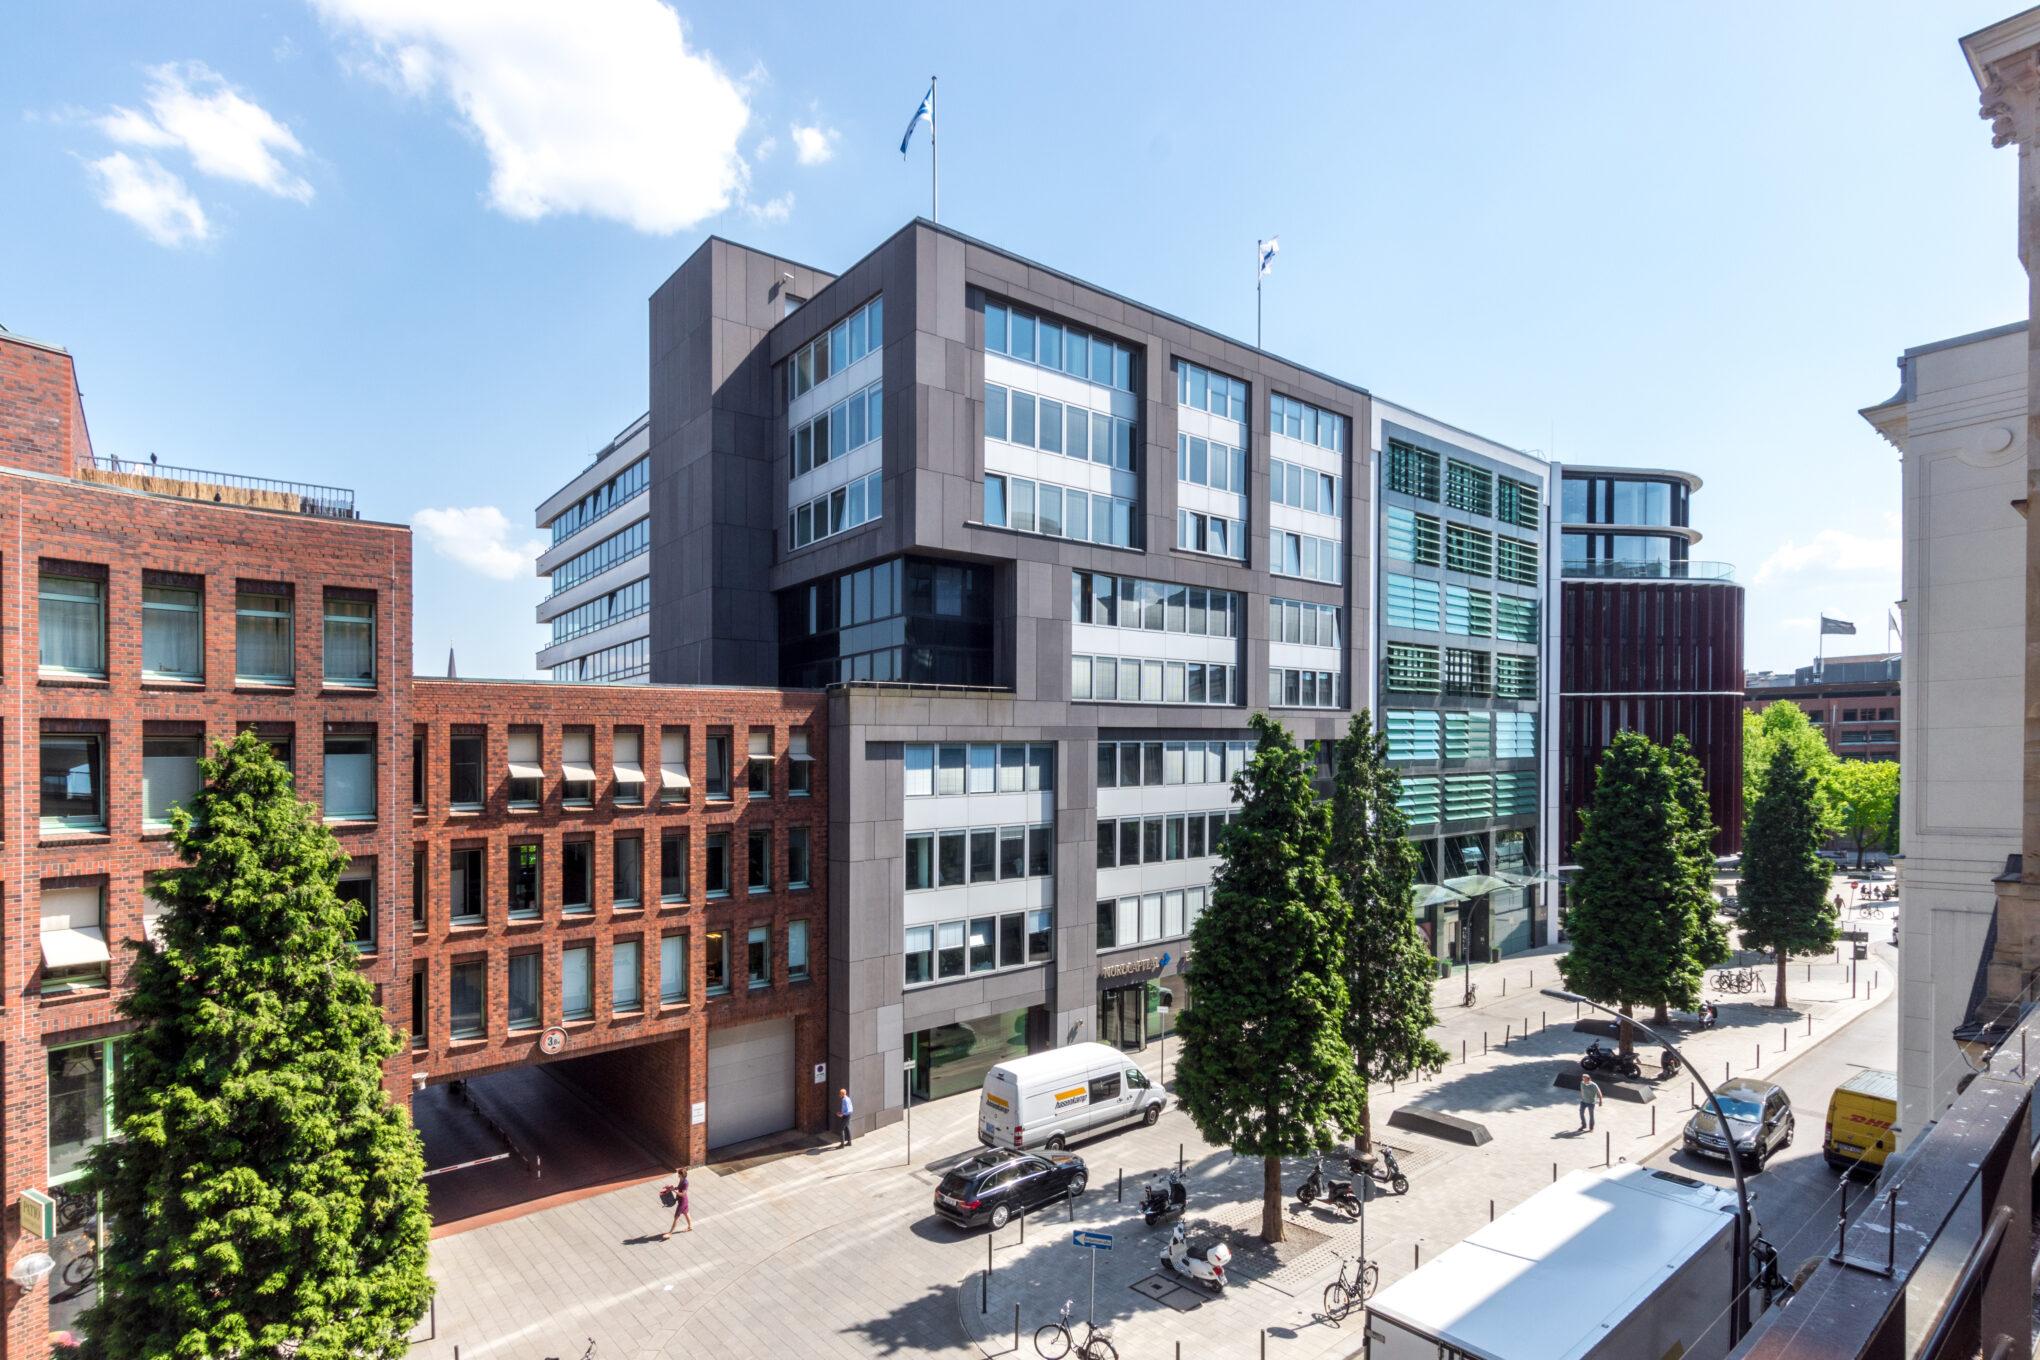 BNP Paribas Real Estate Immobilienberater Immobiliendienstleister Hamburg International Transaction, Consulting, Valuation, Property Management, Investment Management und Property Development